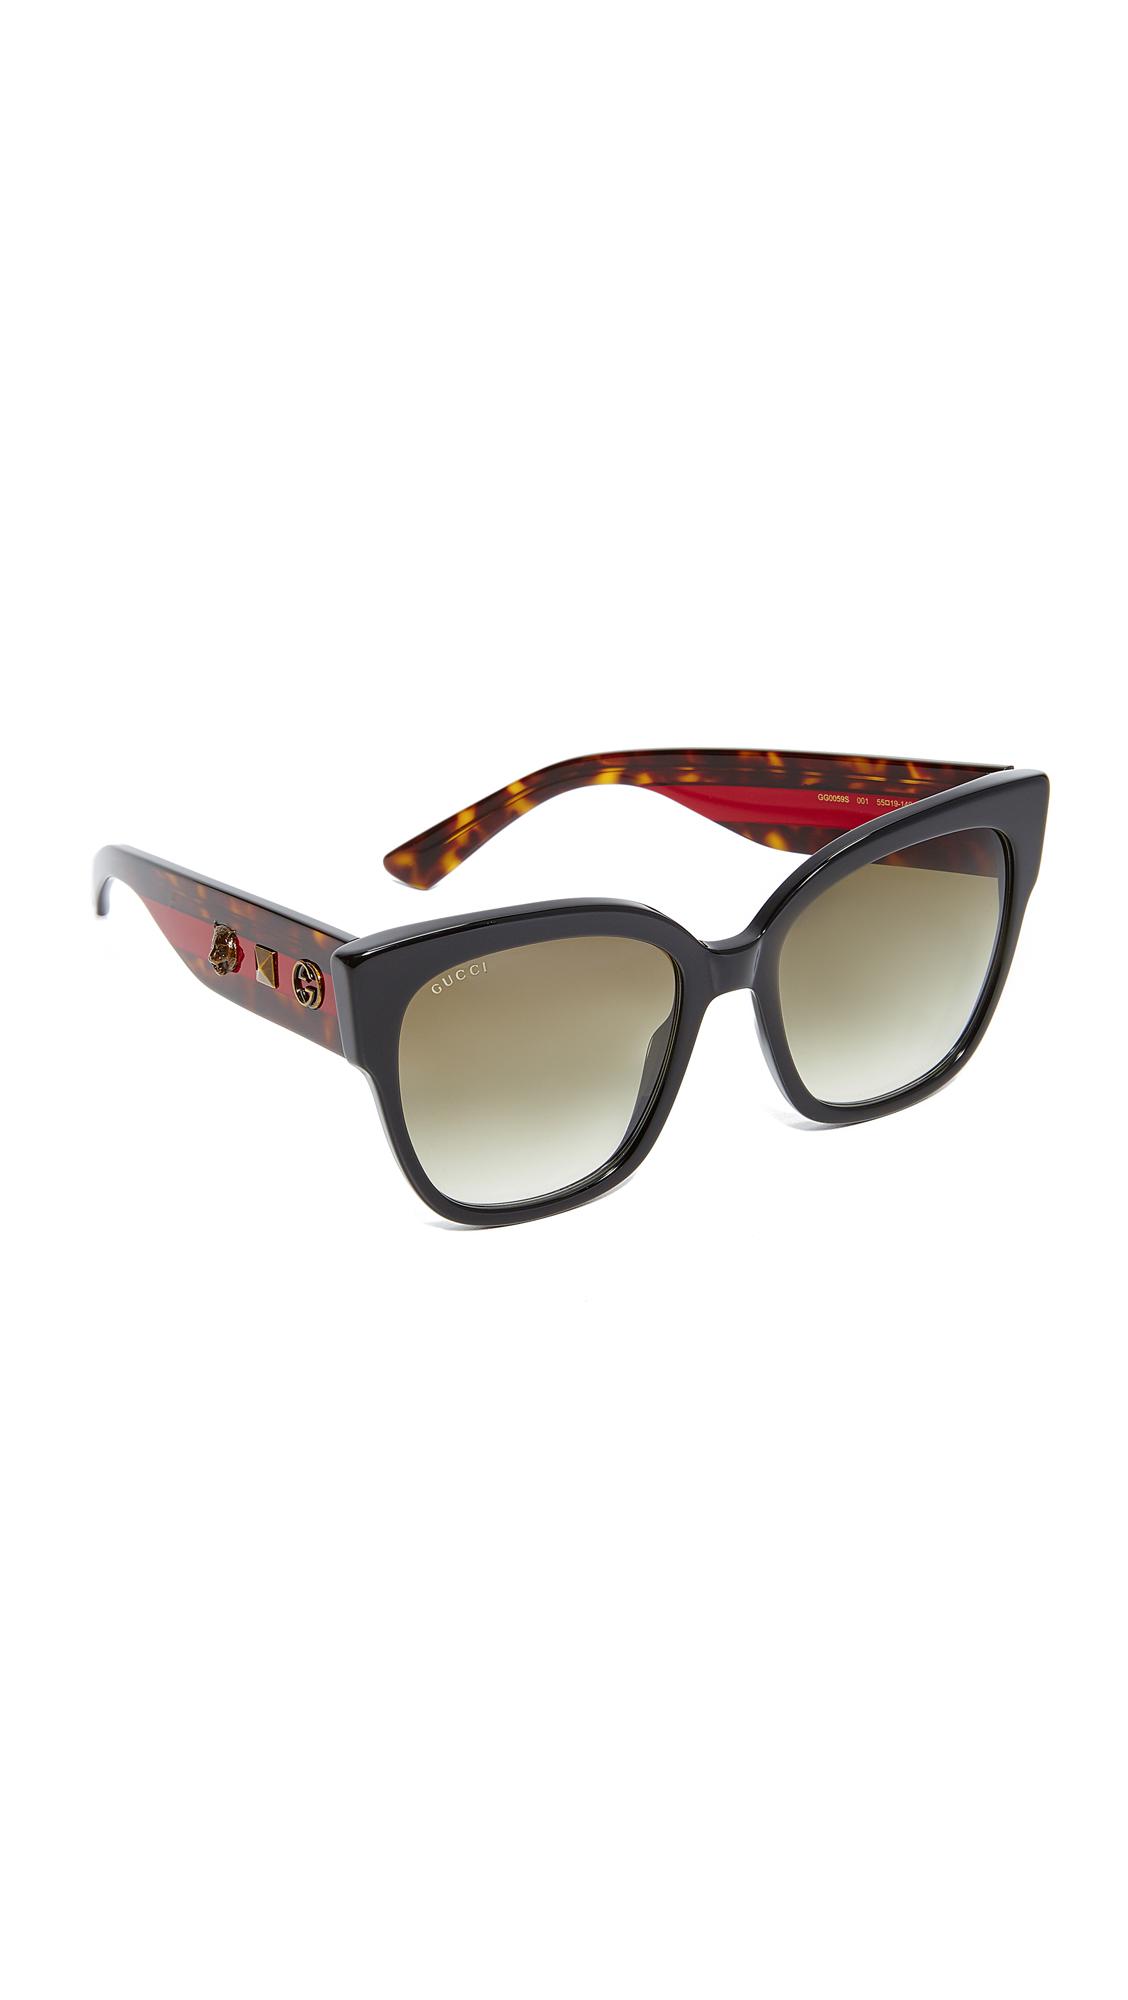 Gucci Oversized Tiger Sunglasses - Black/Green at Shopbop